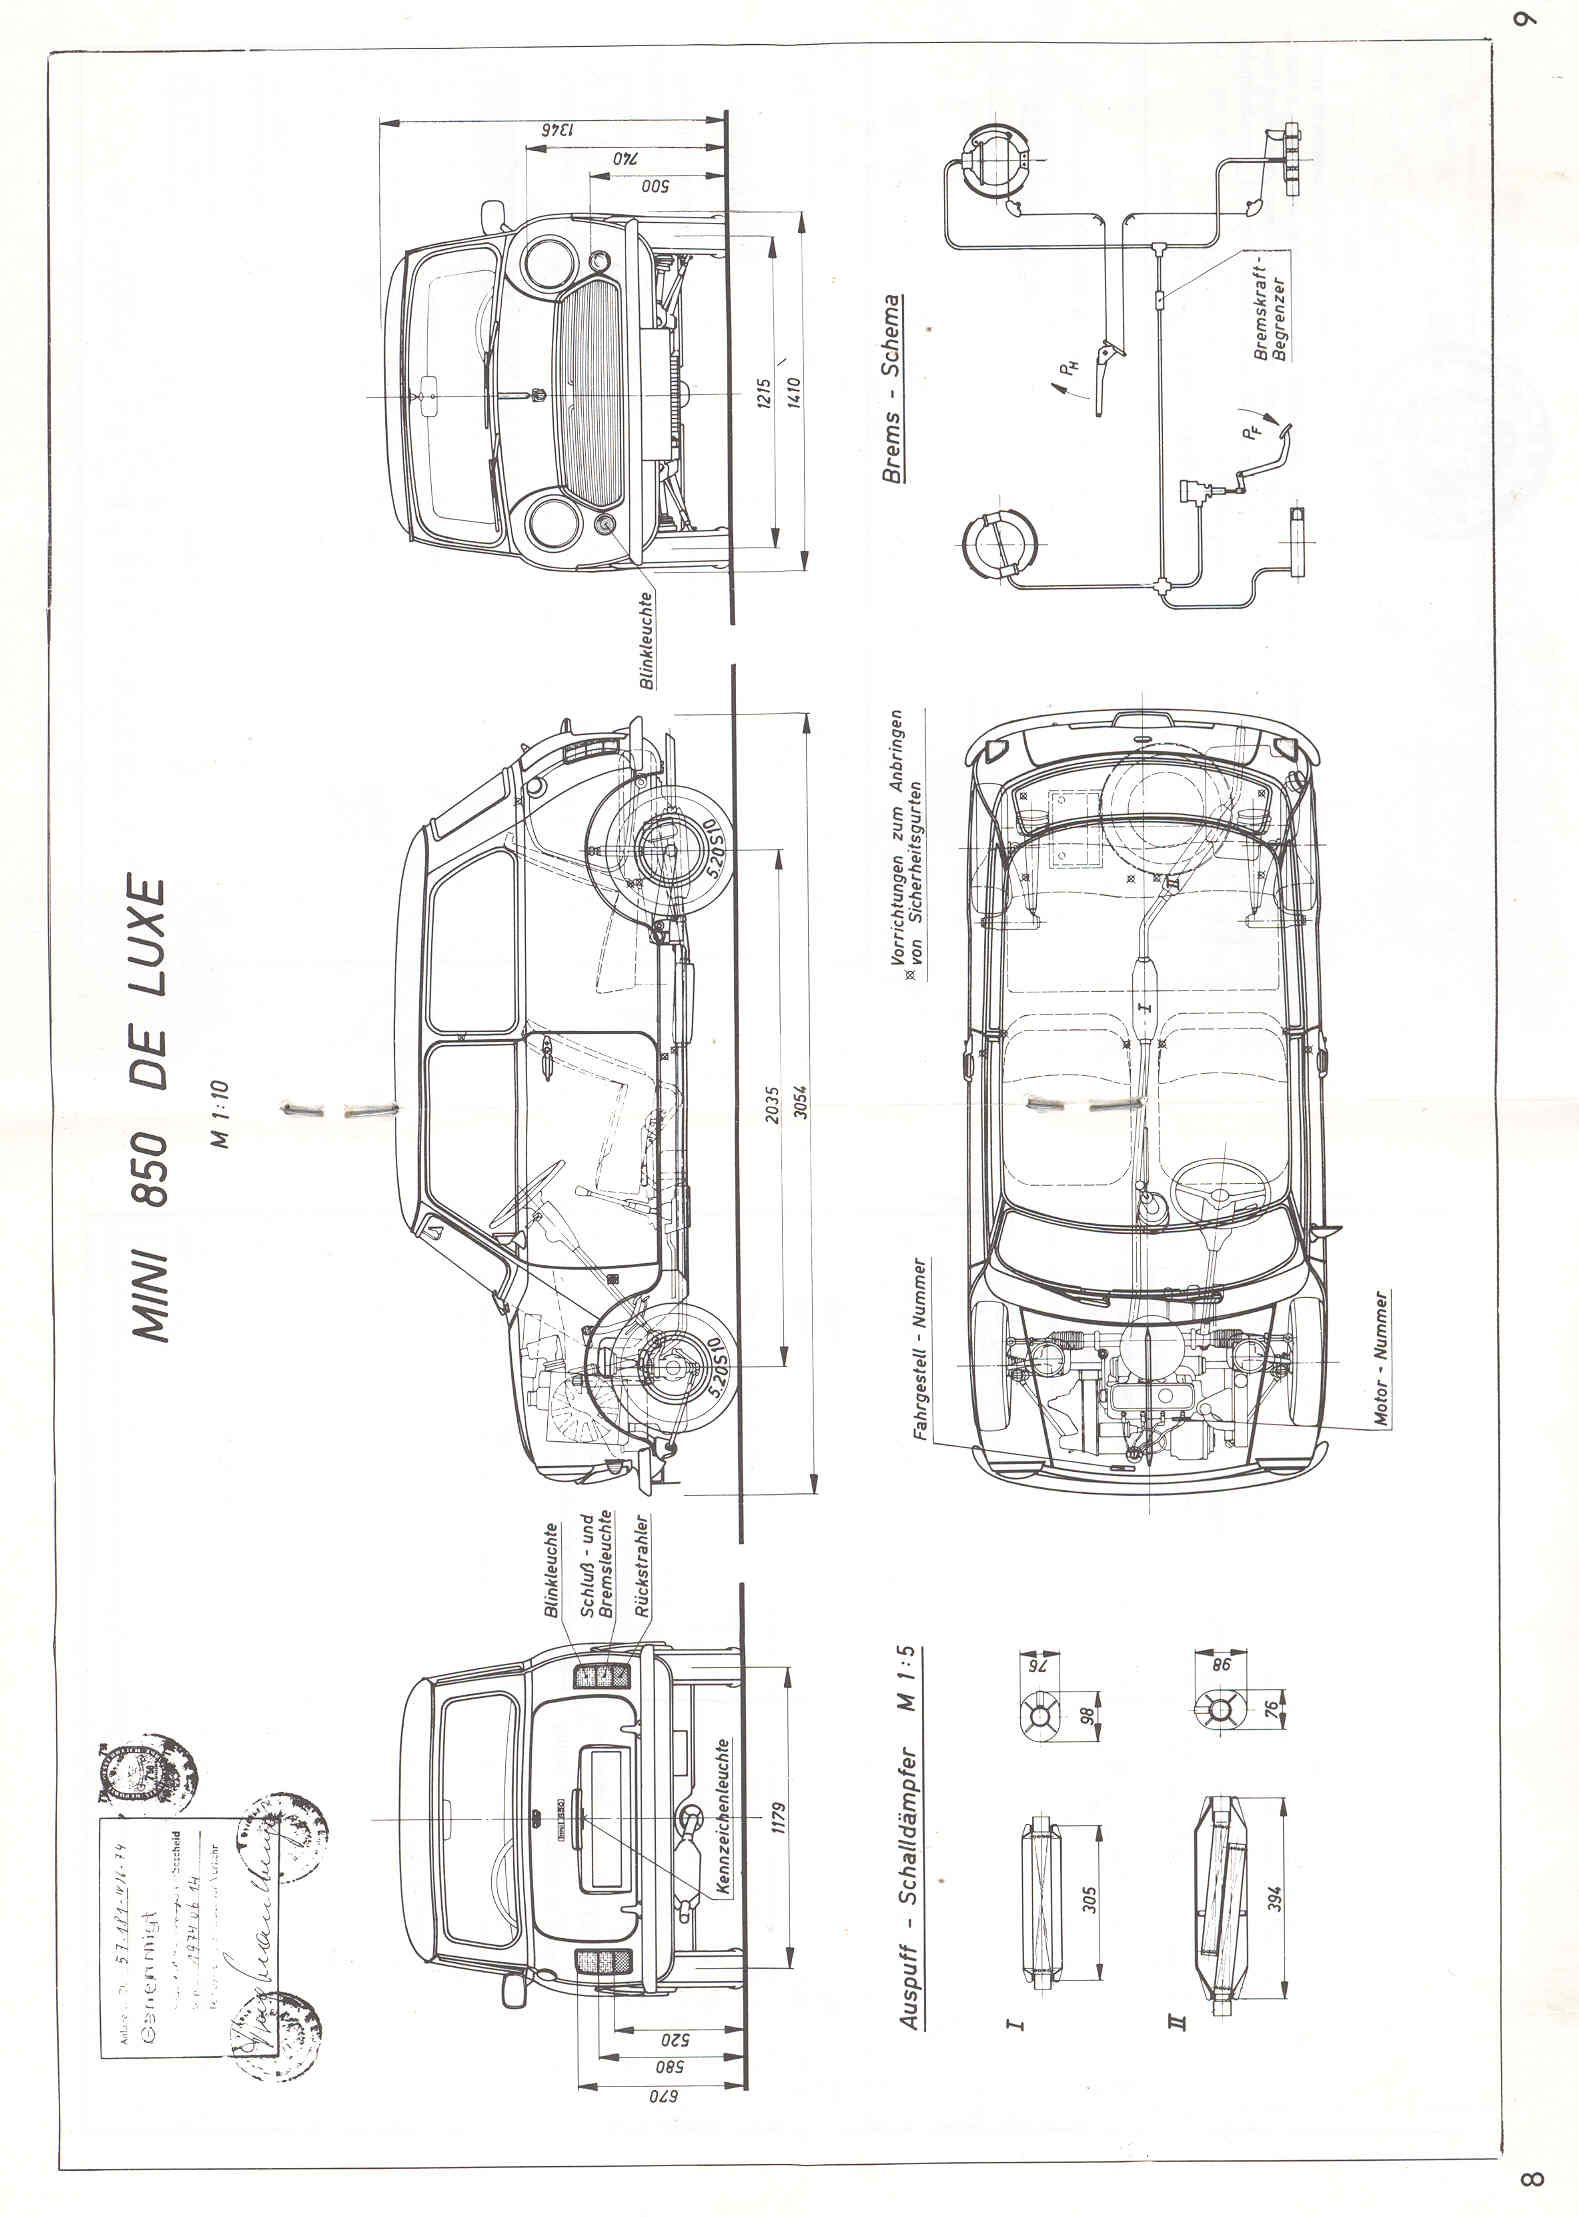 mini cooper countryman engine diagram